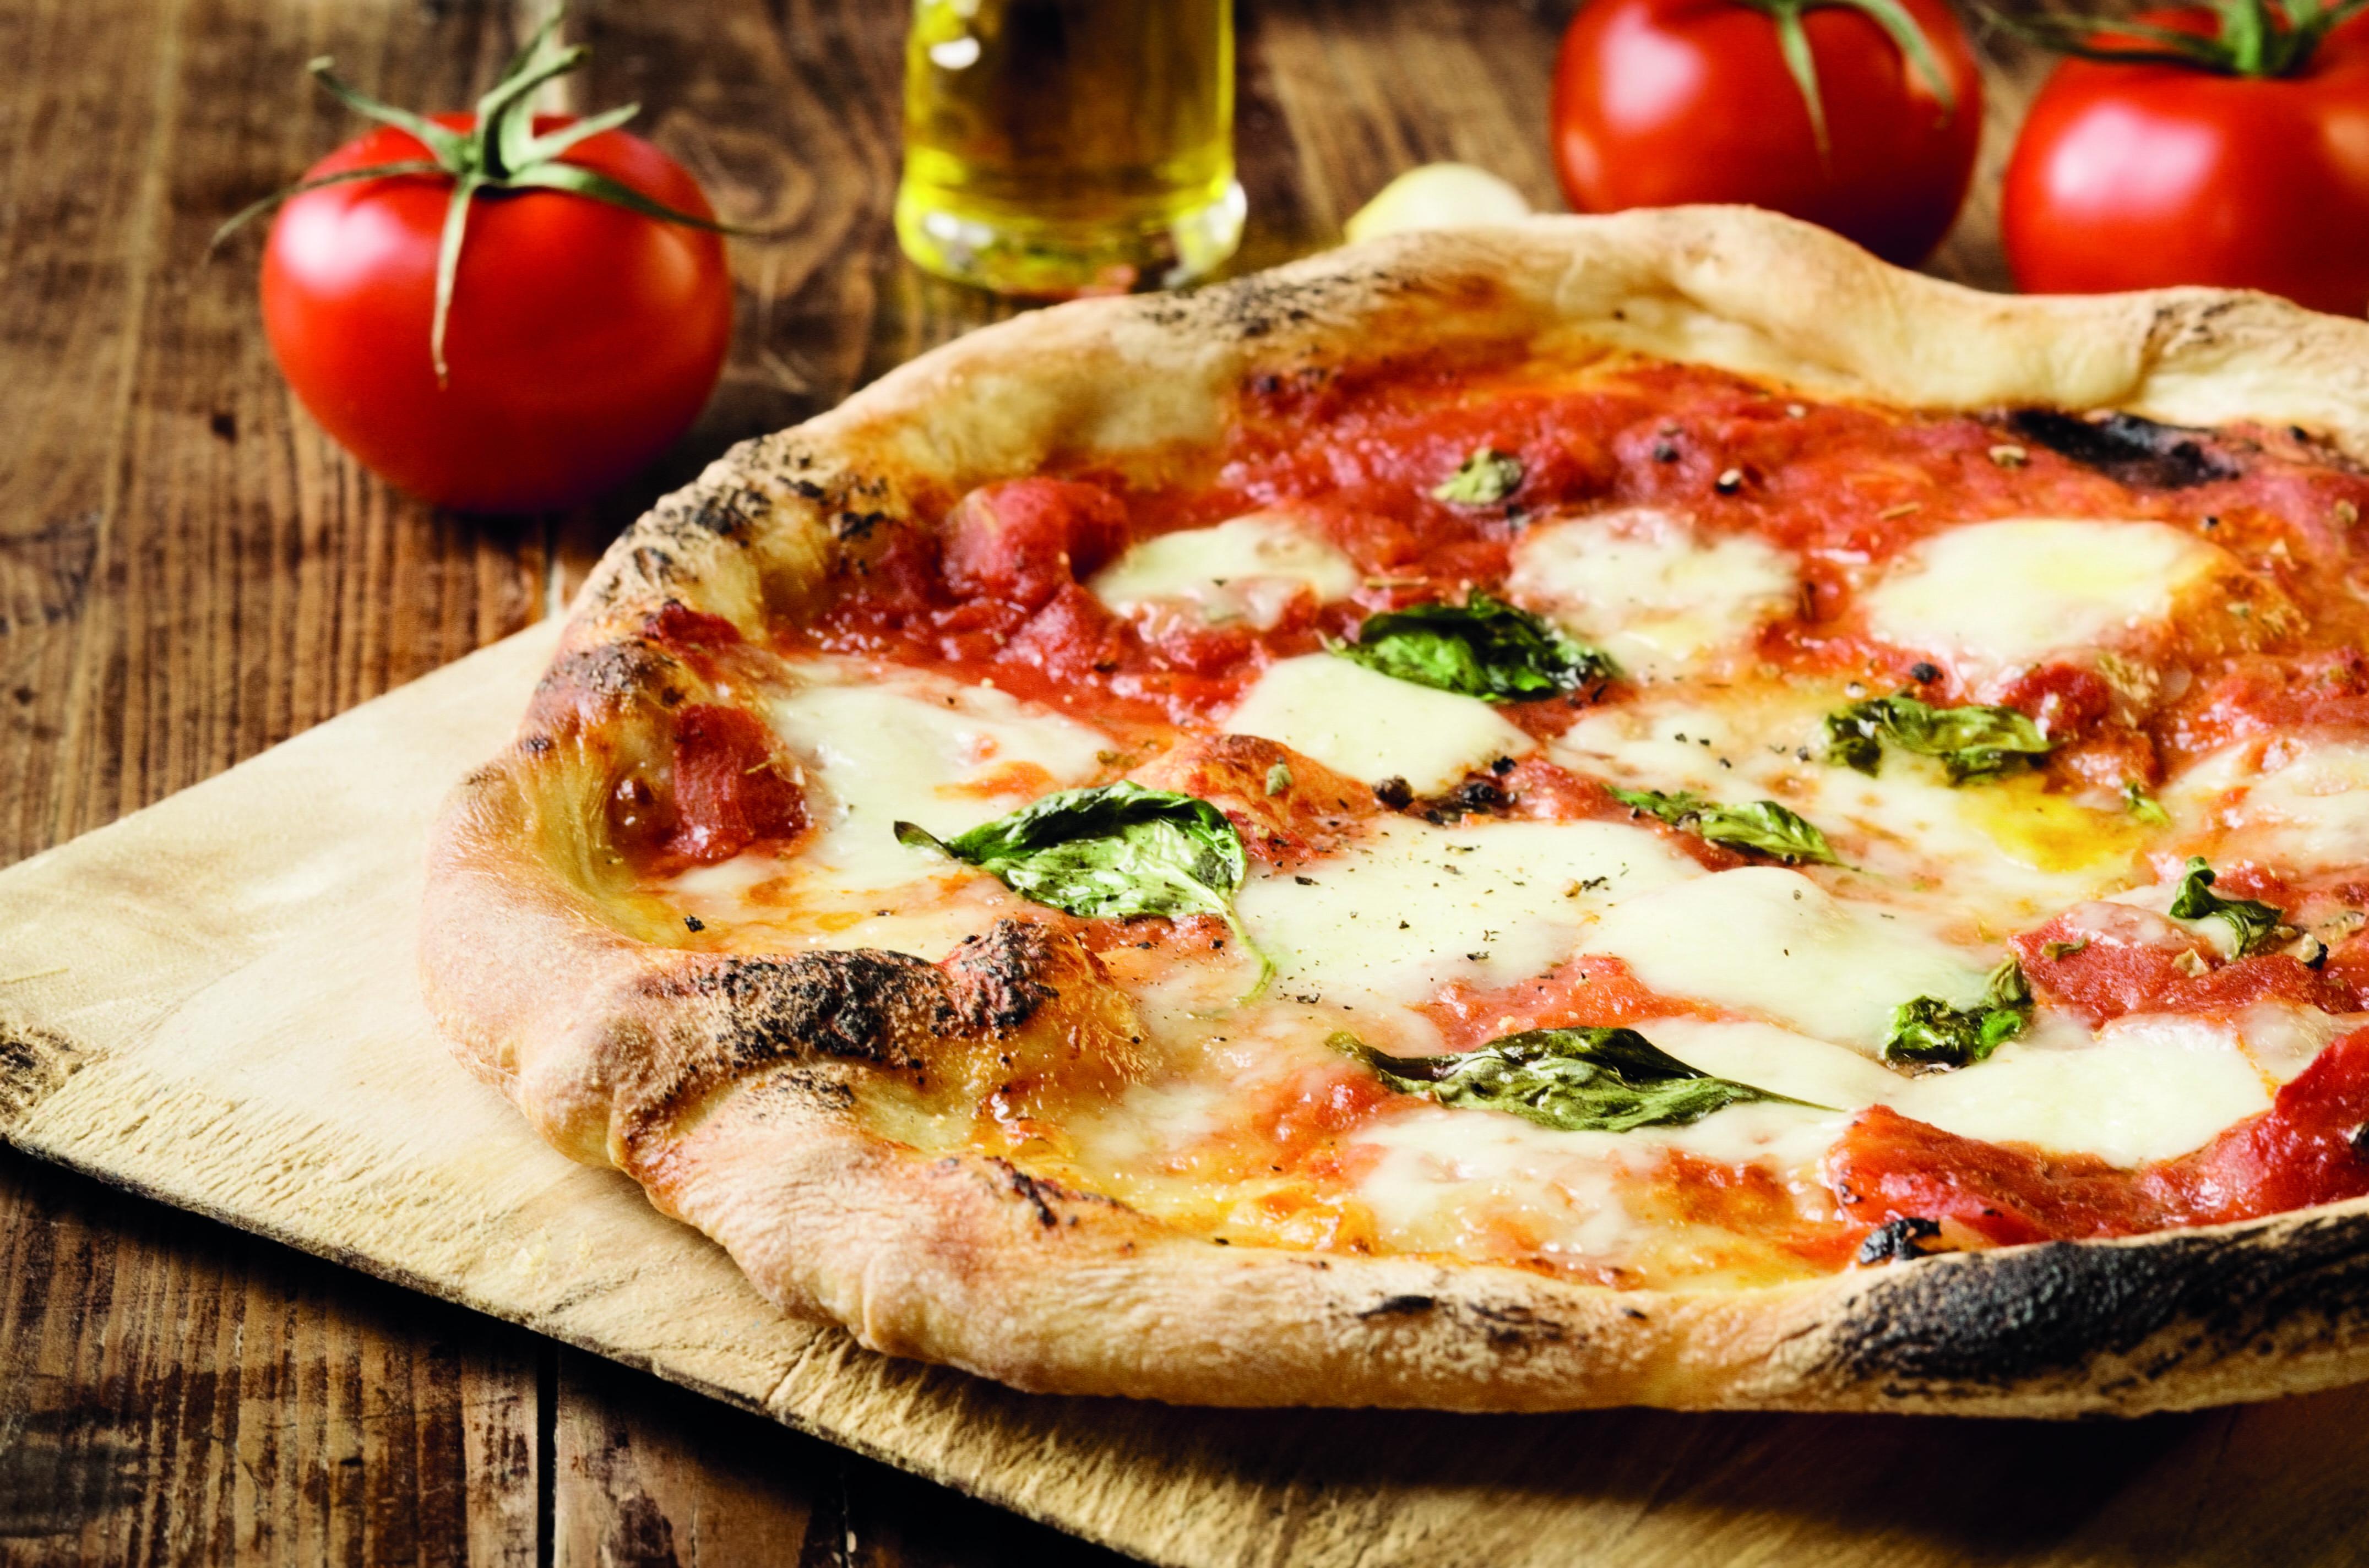 https://d1e3z2jco40k3v.cloudfront.net/-/media/foodservicefr/recettes/pizza-et-tarte/pizza-terre-et-mer.jpg?vd=20200611T222102Z&hash=5B2A7C3A80CE1849C4C0305F780E7278